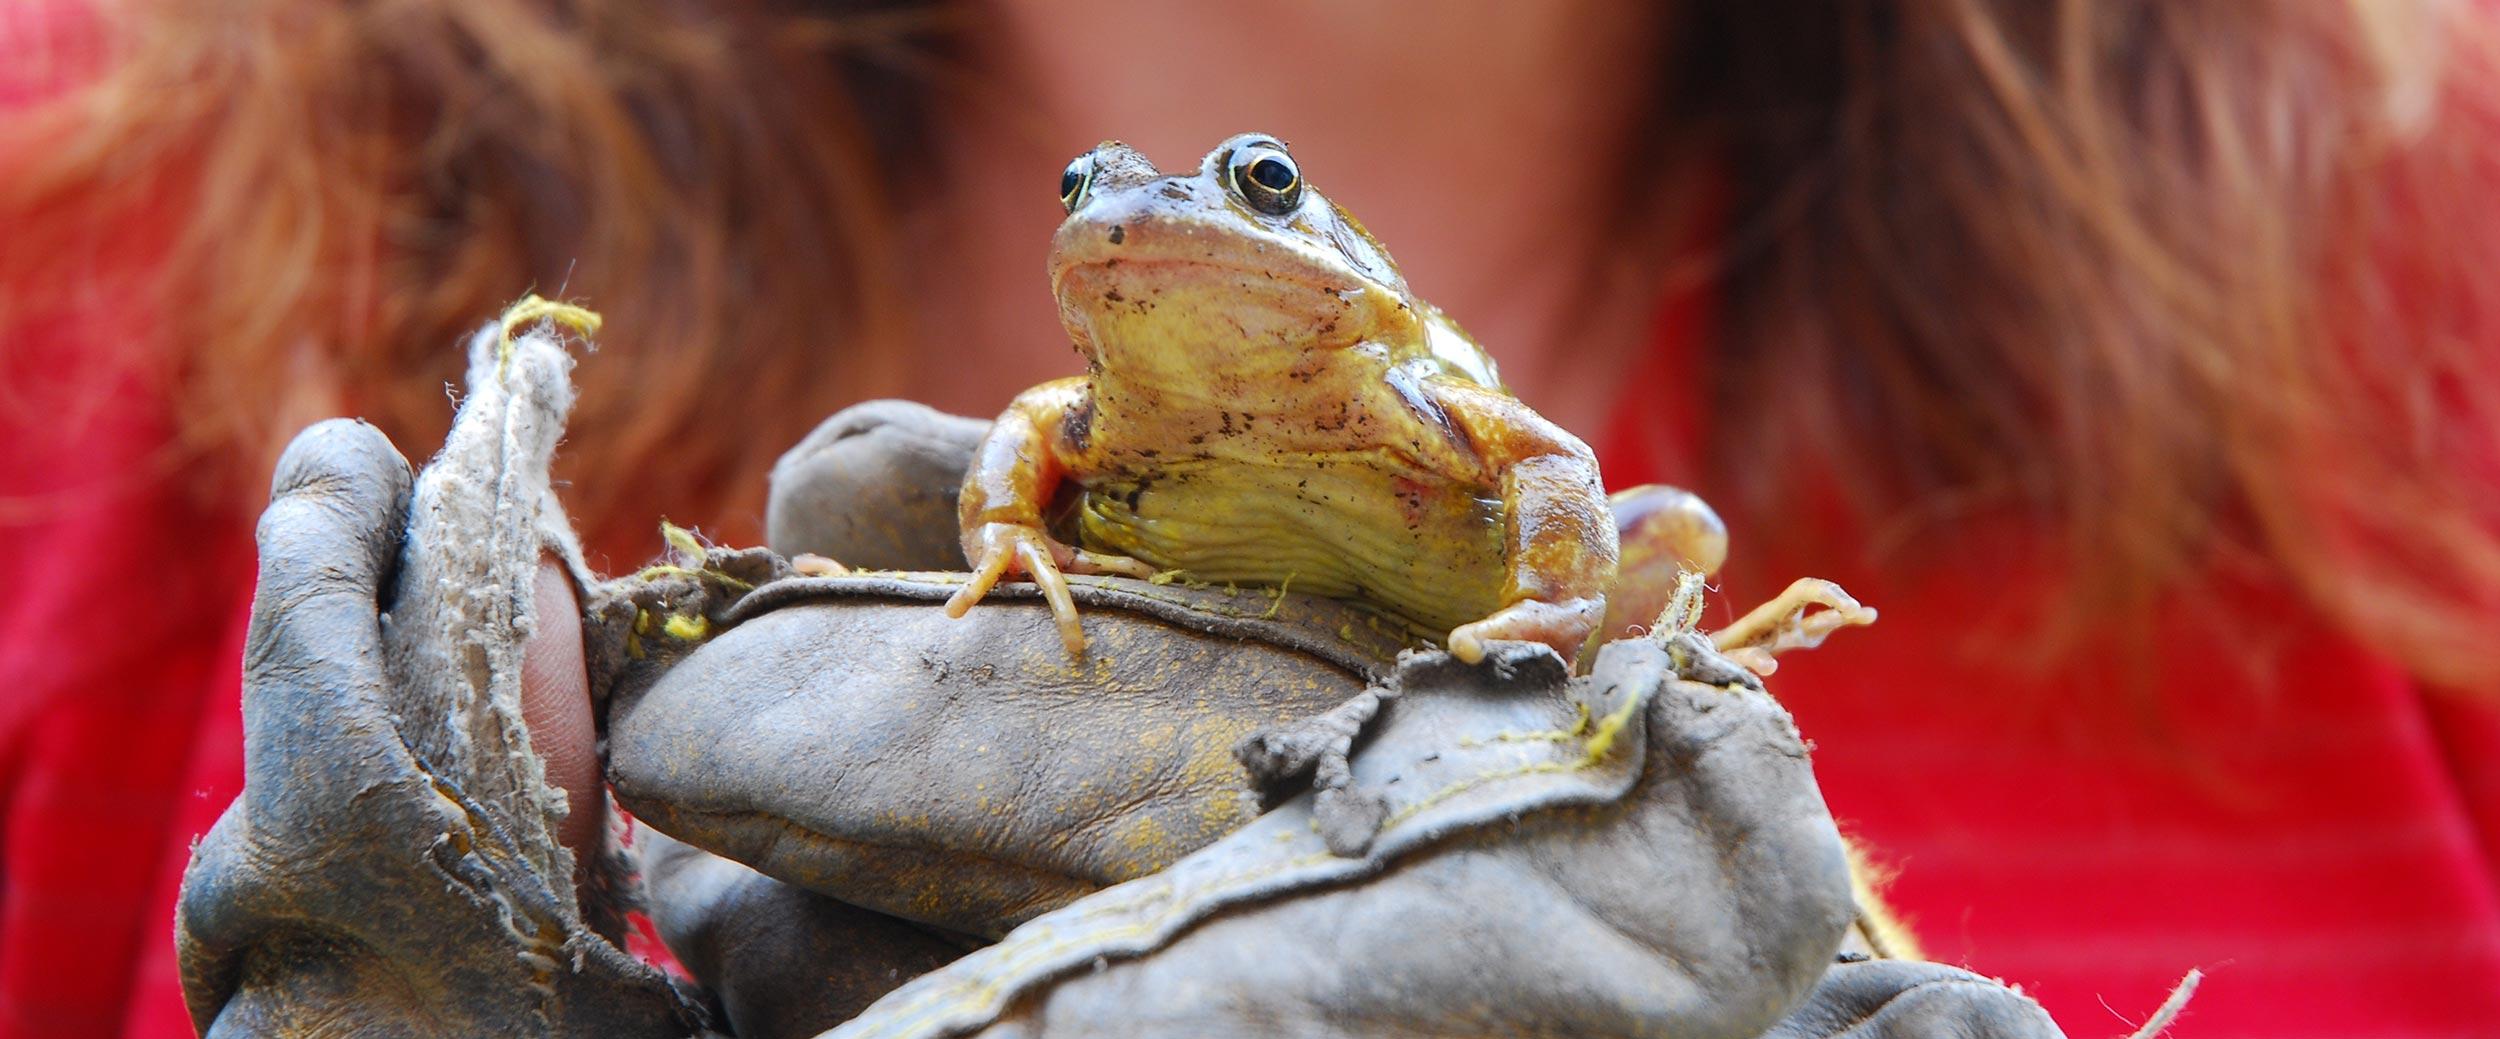 37.-Garden-visitor.jpg